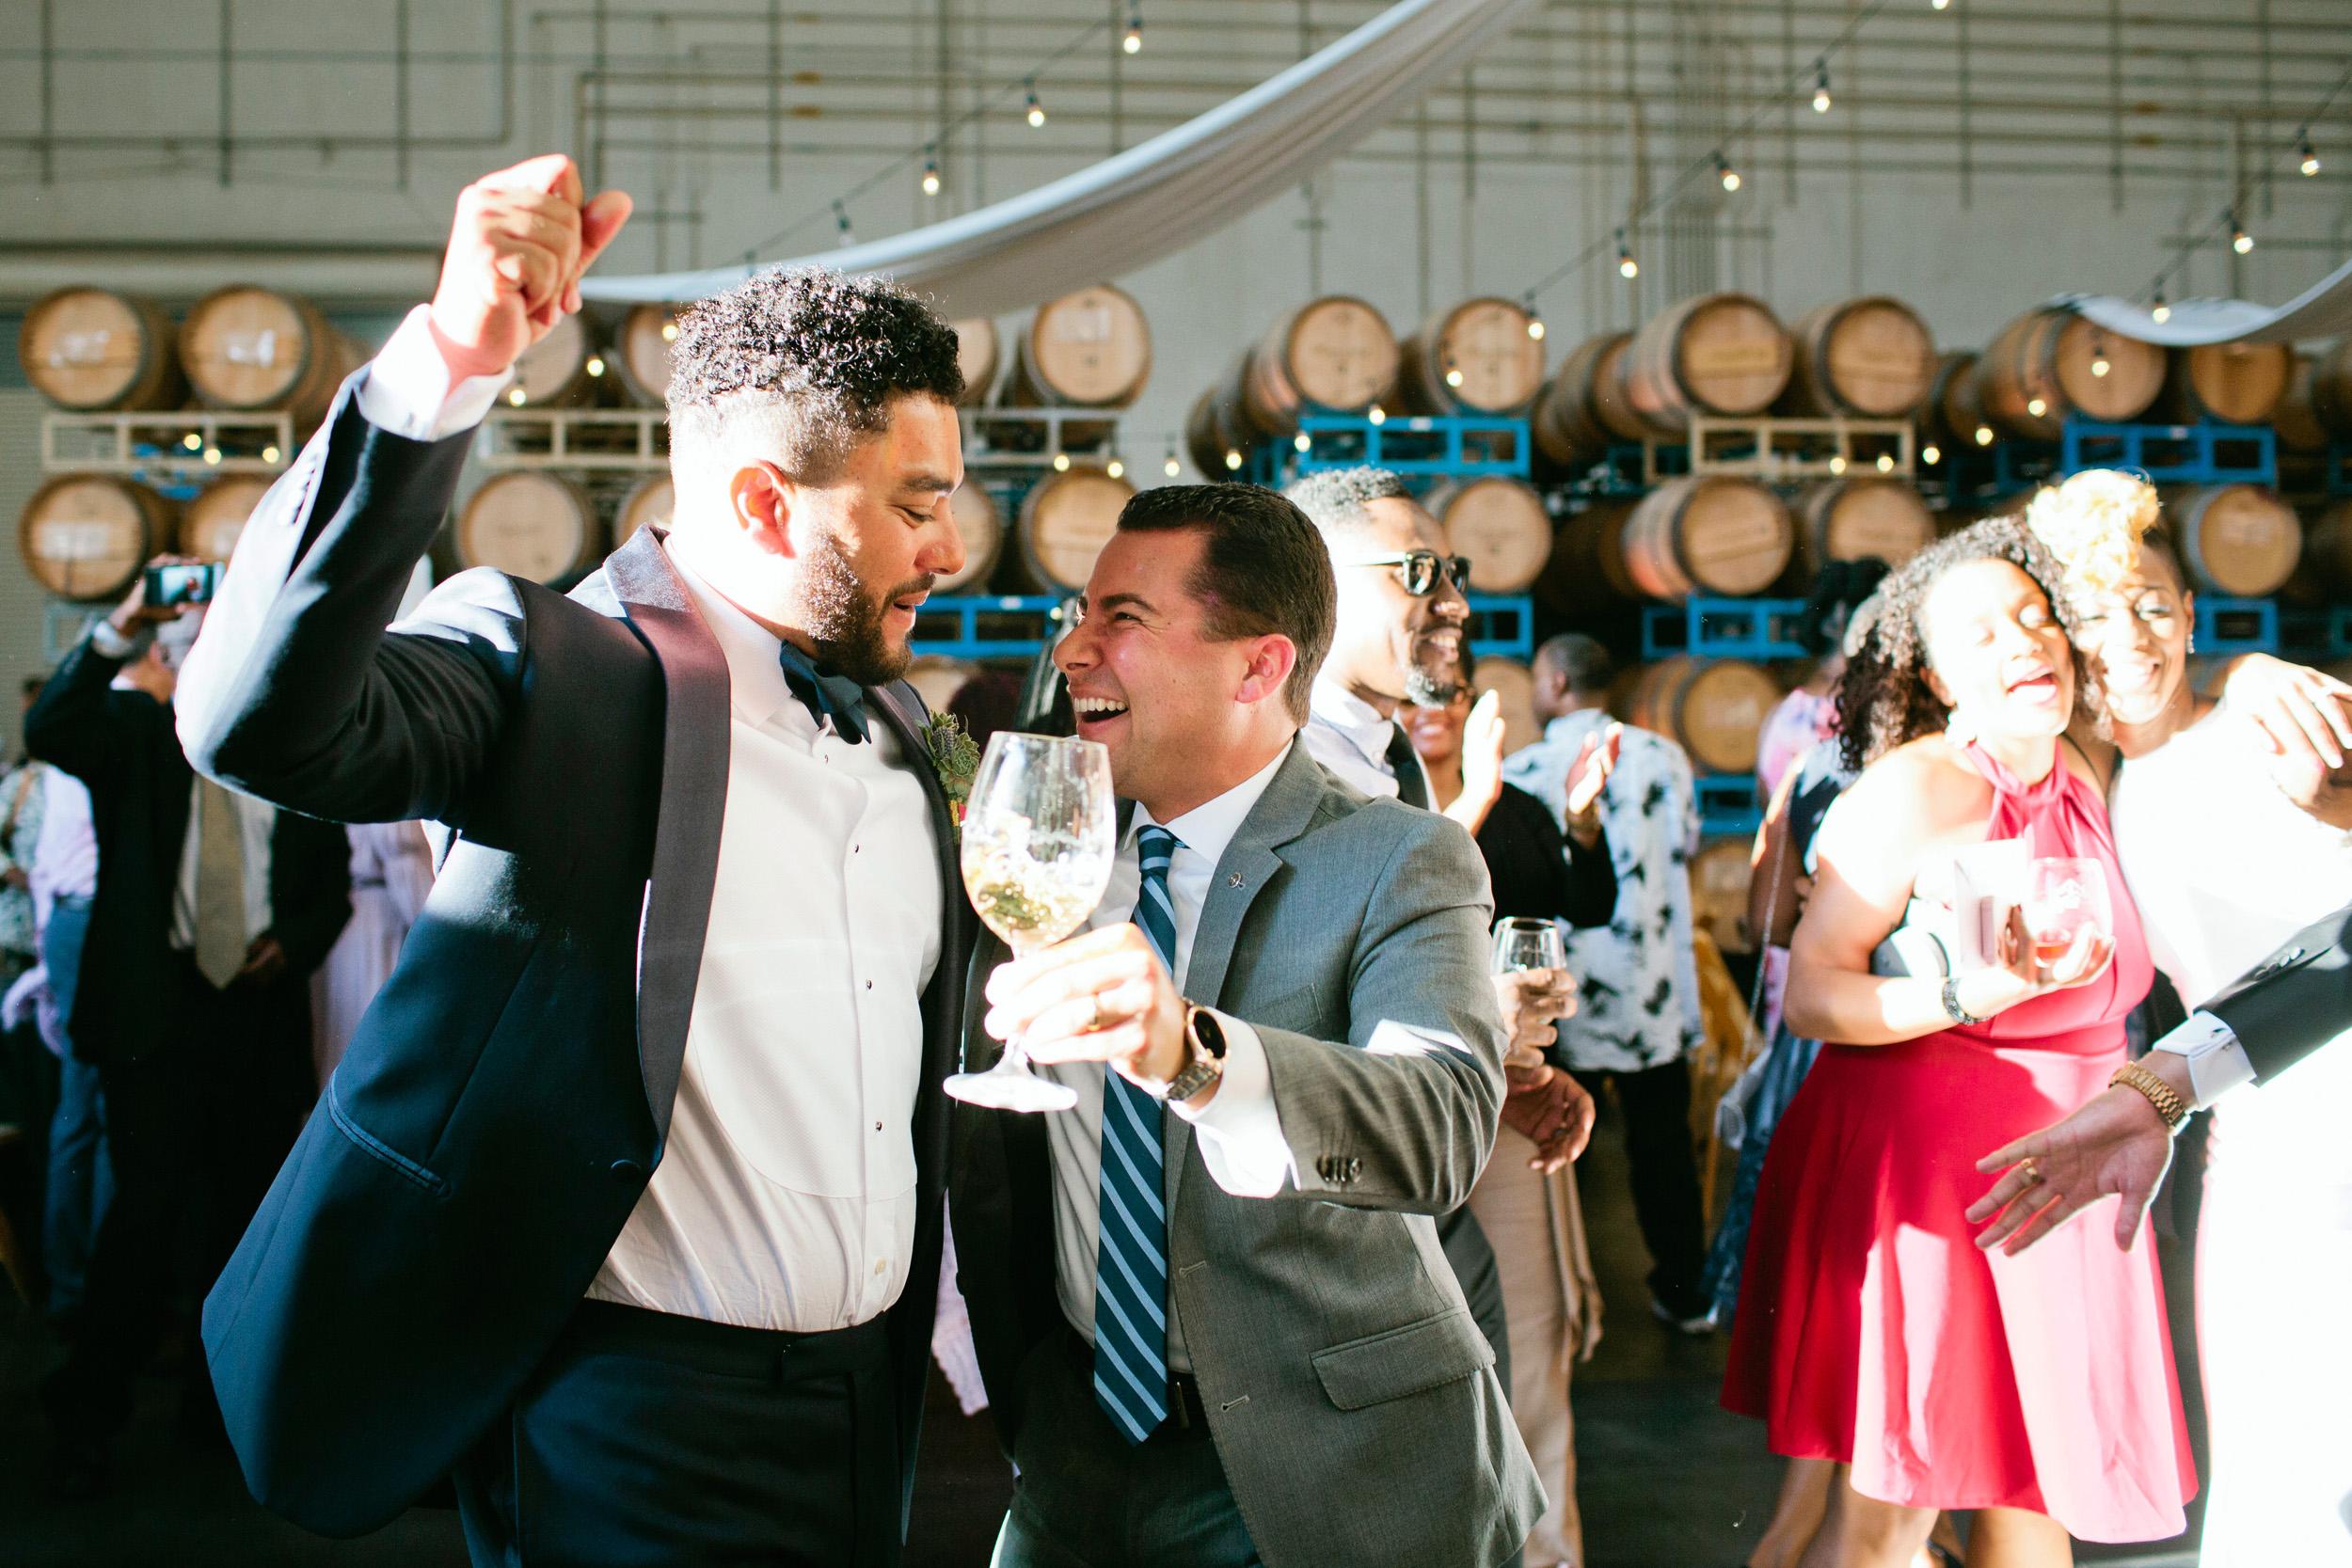 Alameda-Rockwall-Winery-Wedding-039.JPG